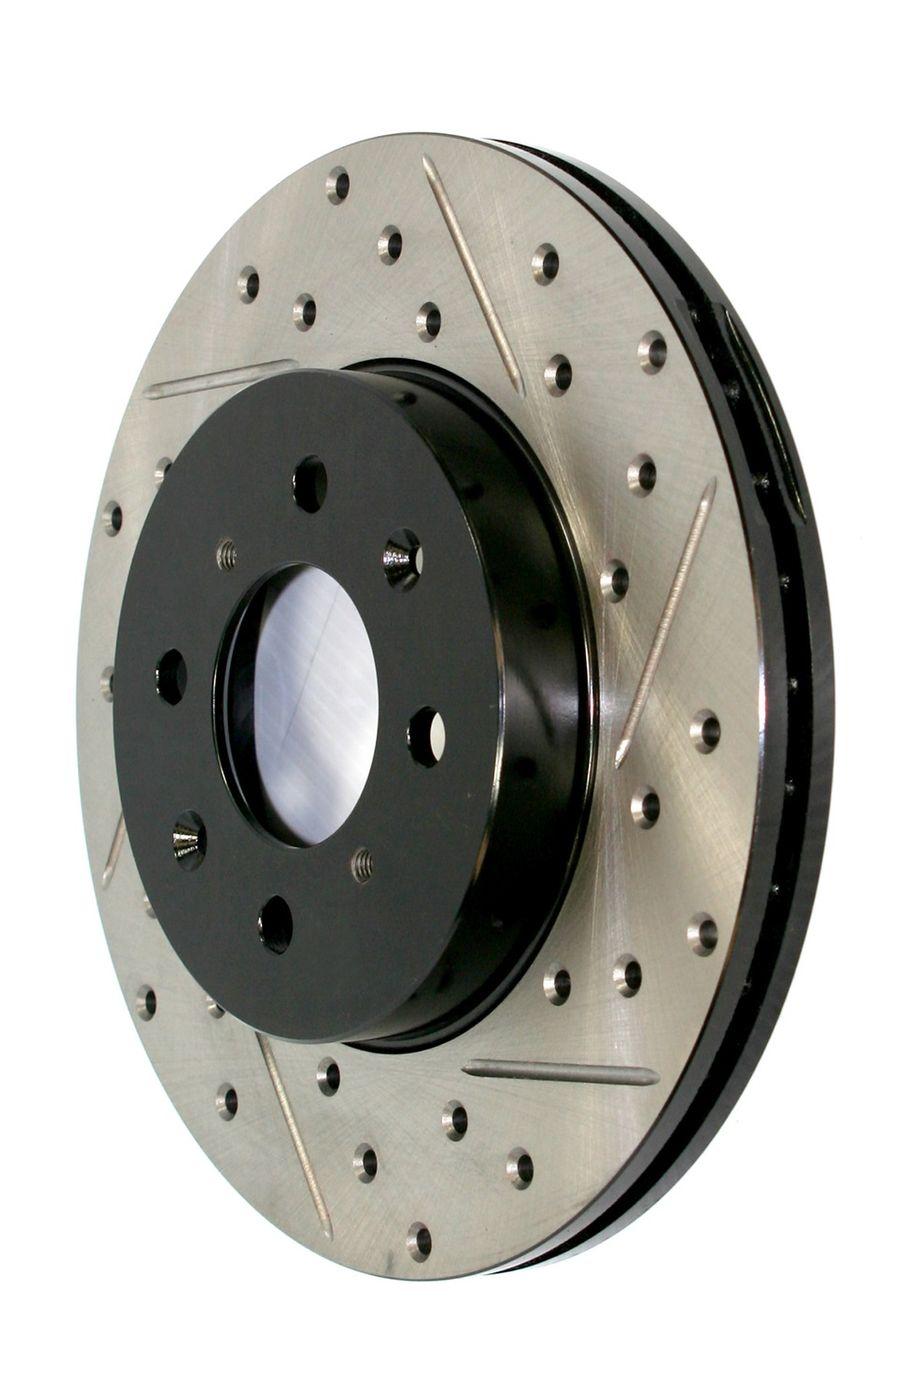 Subaru Impreza StopTech Disc Brake Rotors Brakes StopTech Sport Drilled/Slotted Disc 127.47023R